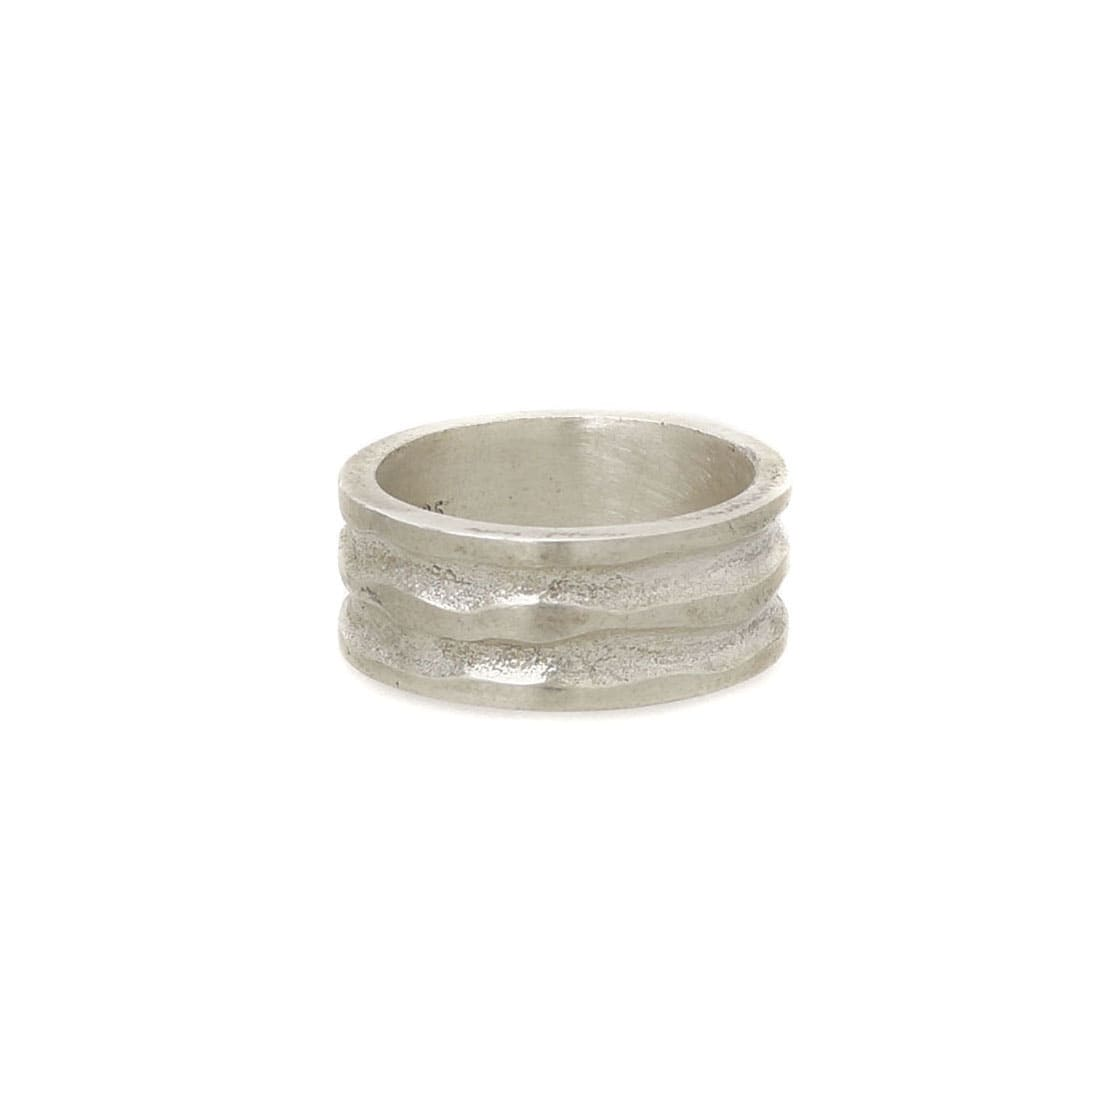 Virgin Stone Bourton Ring